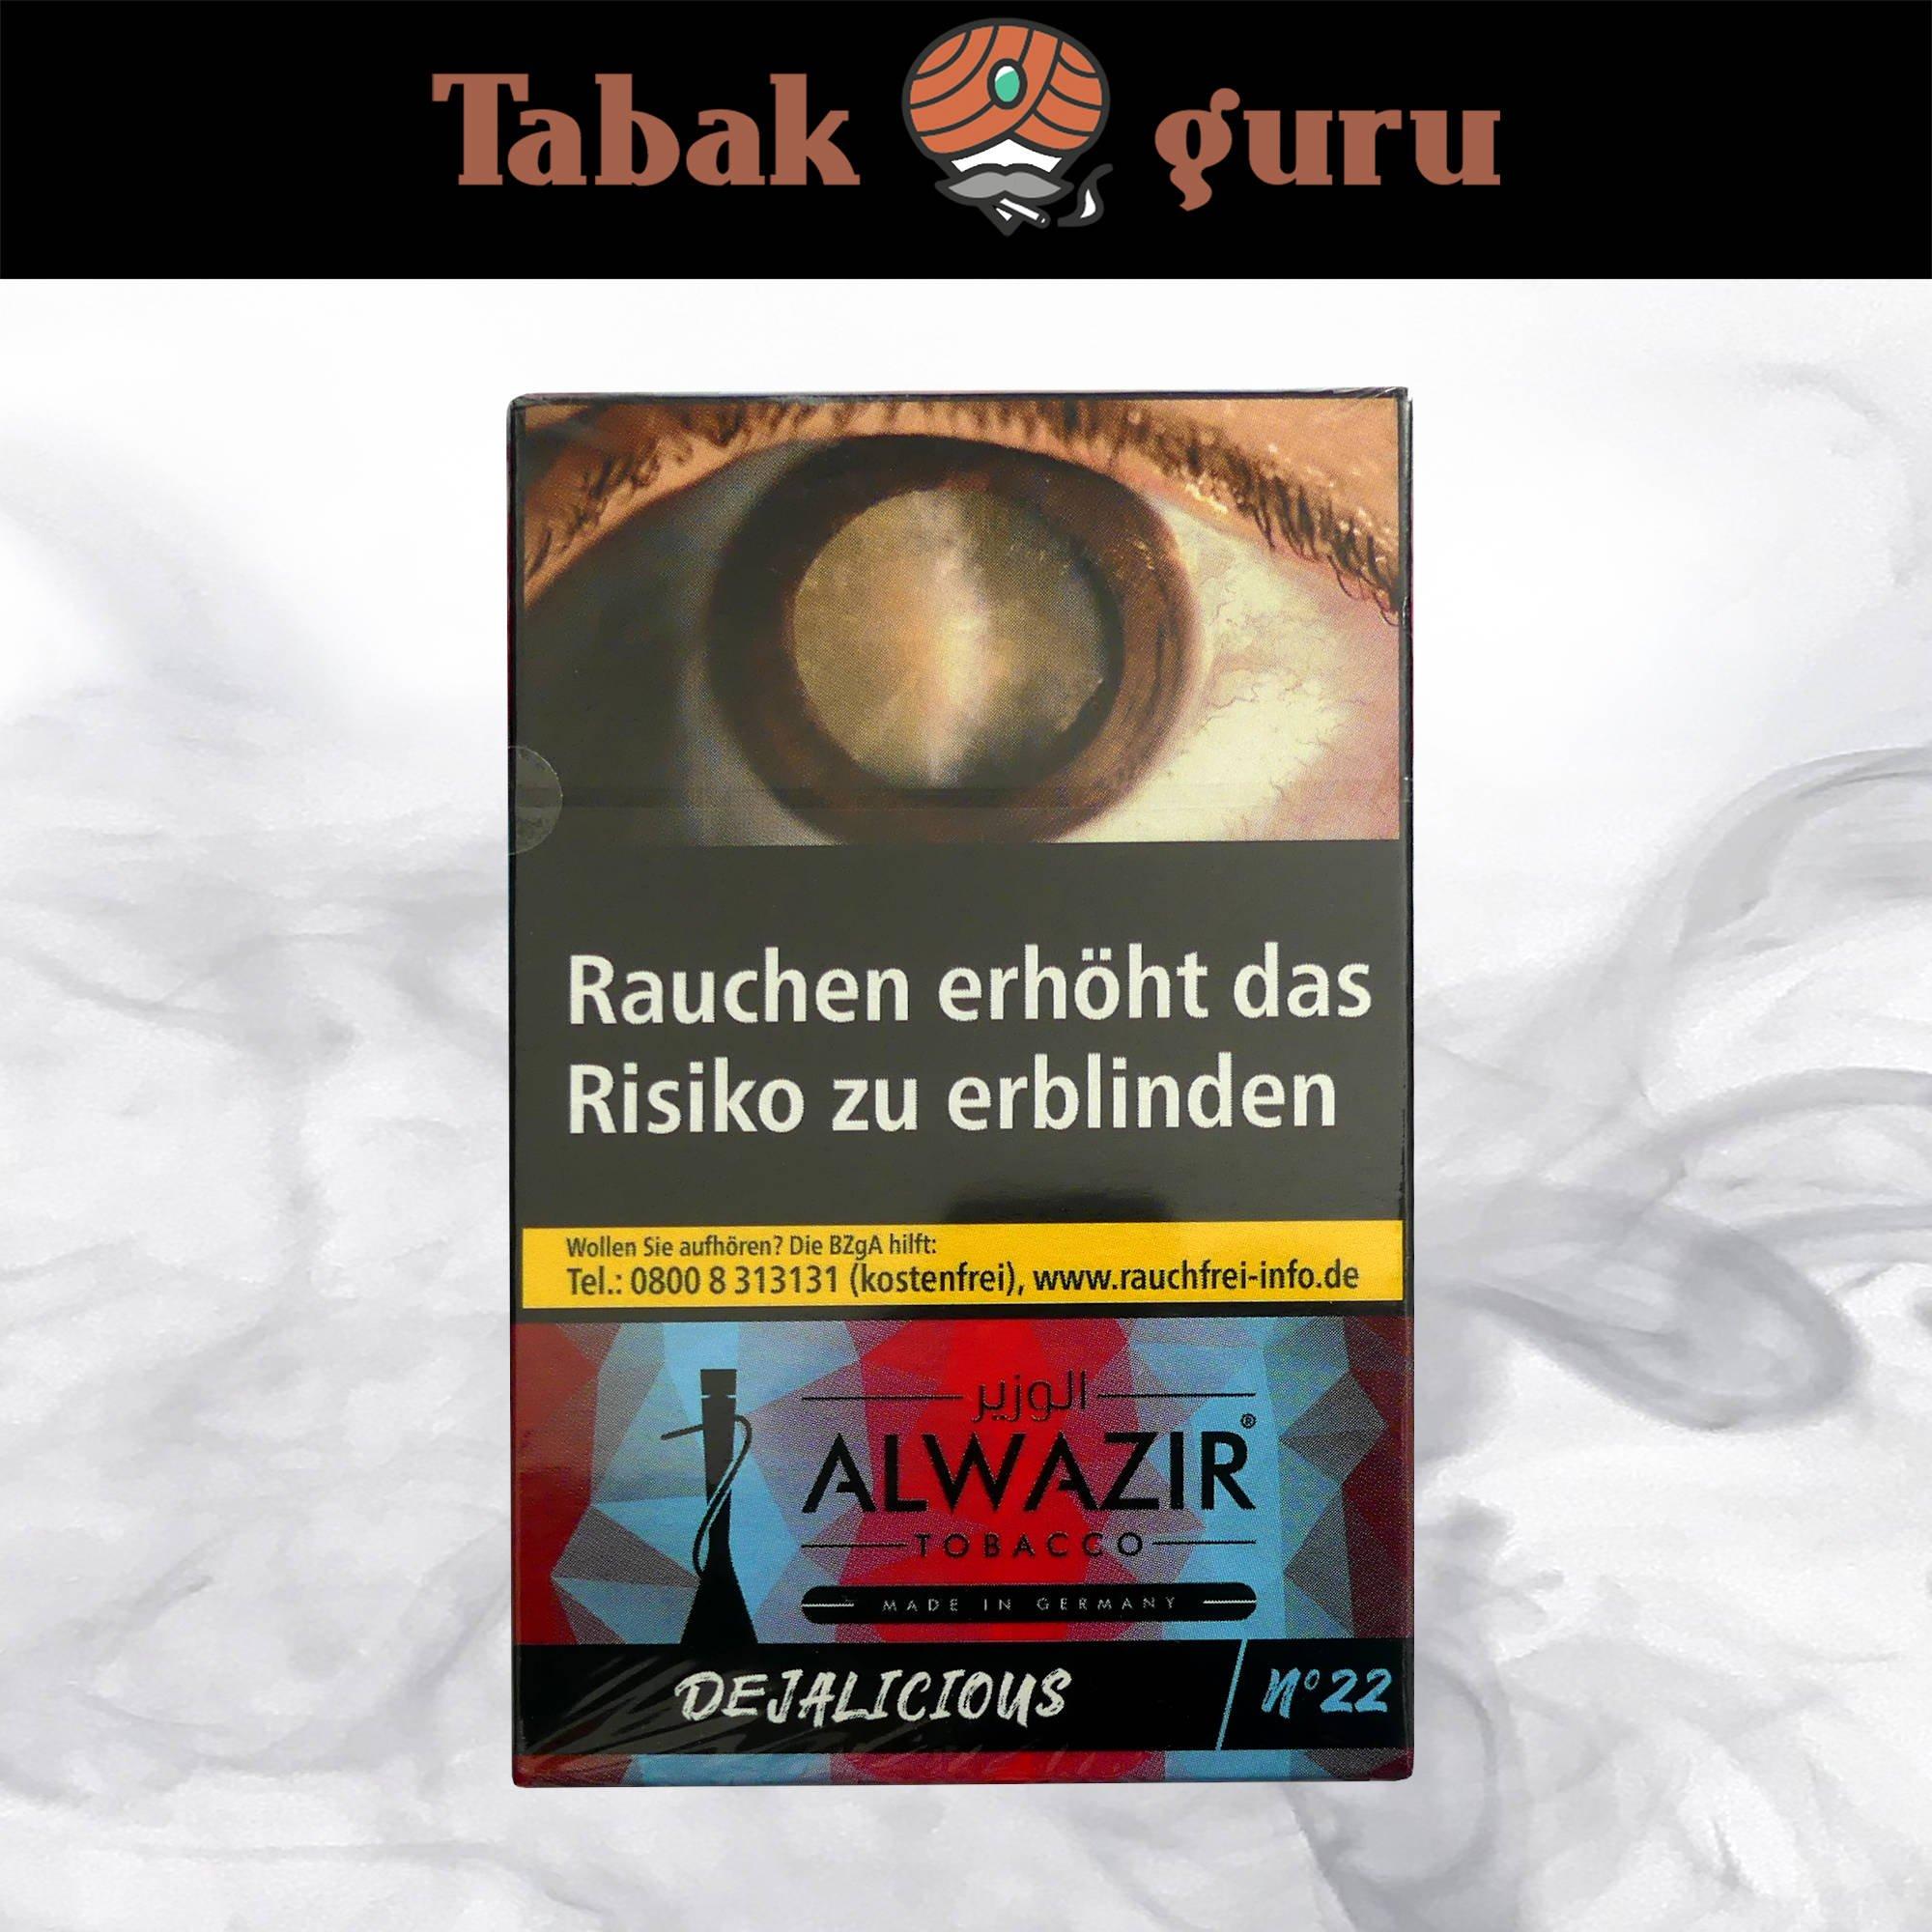 Alwazir Shisha Tabak - No. 22 - DEJALICIOUS 50g